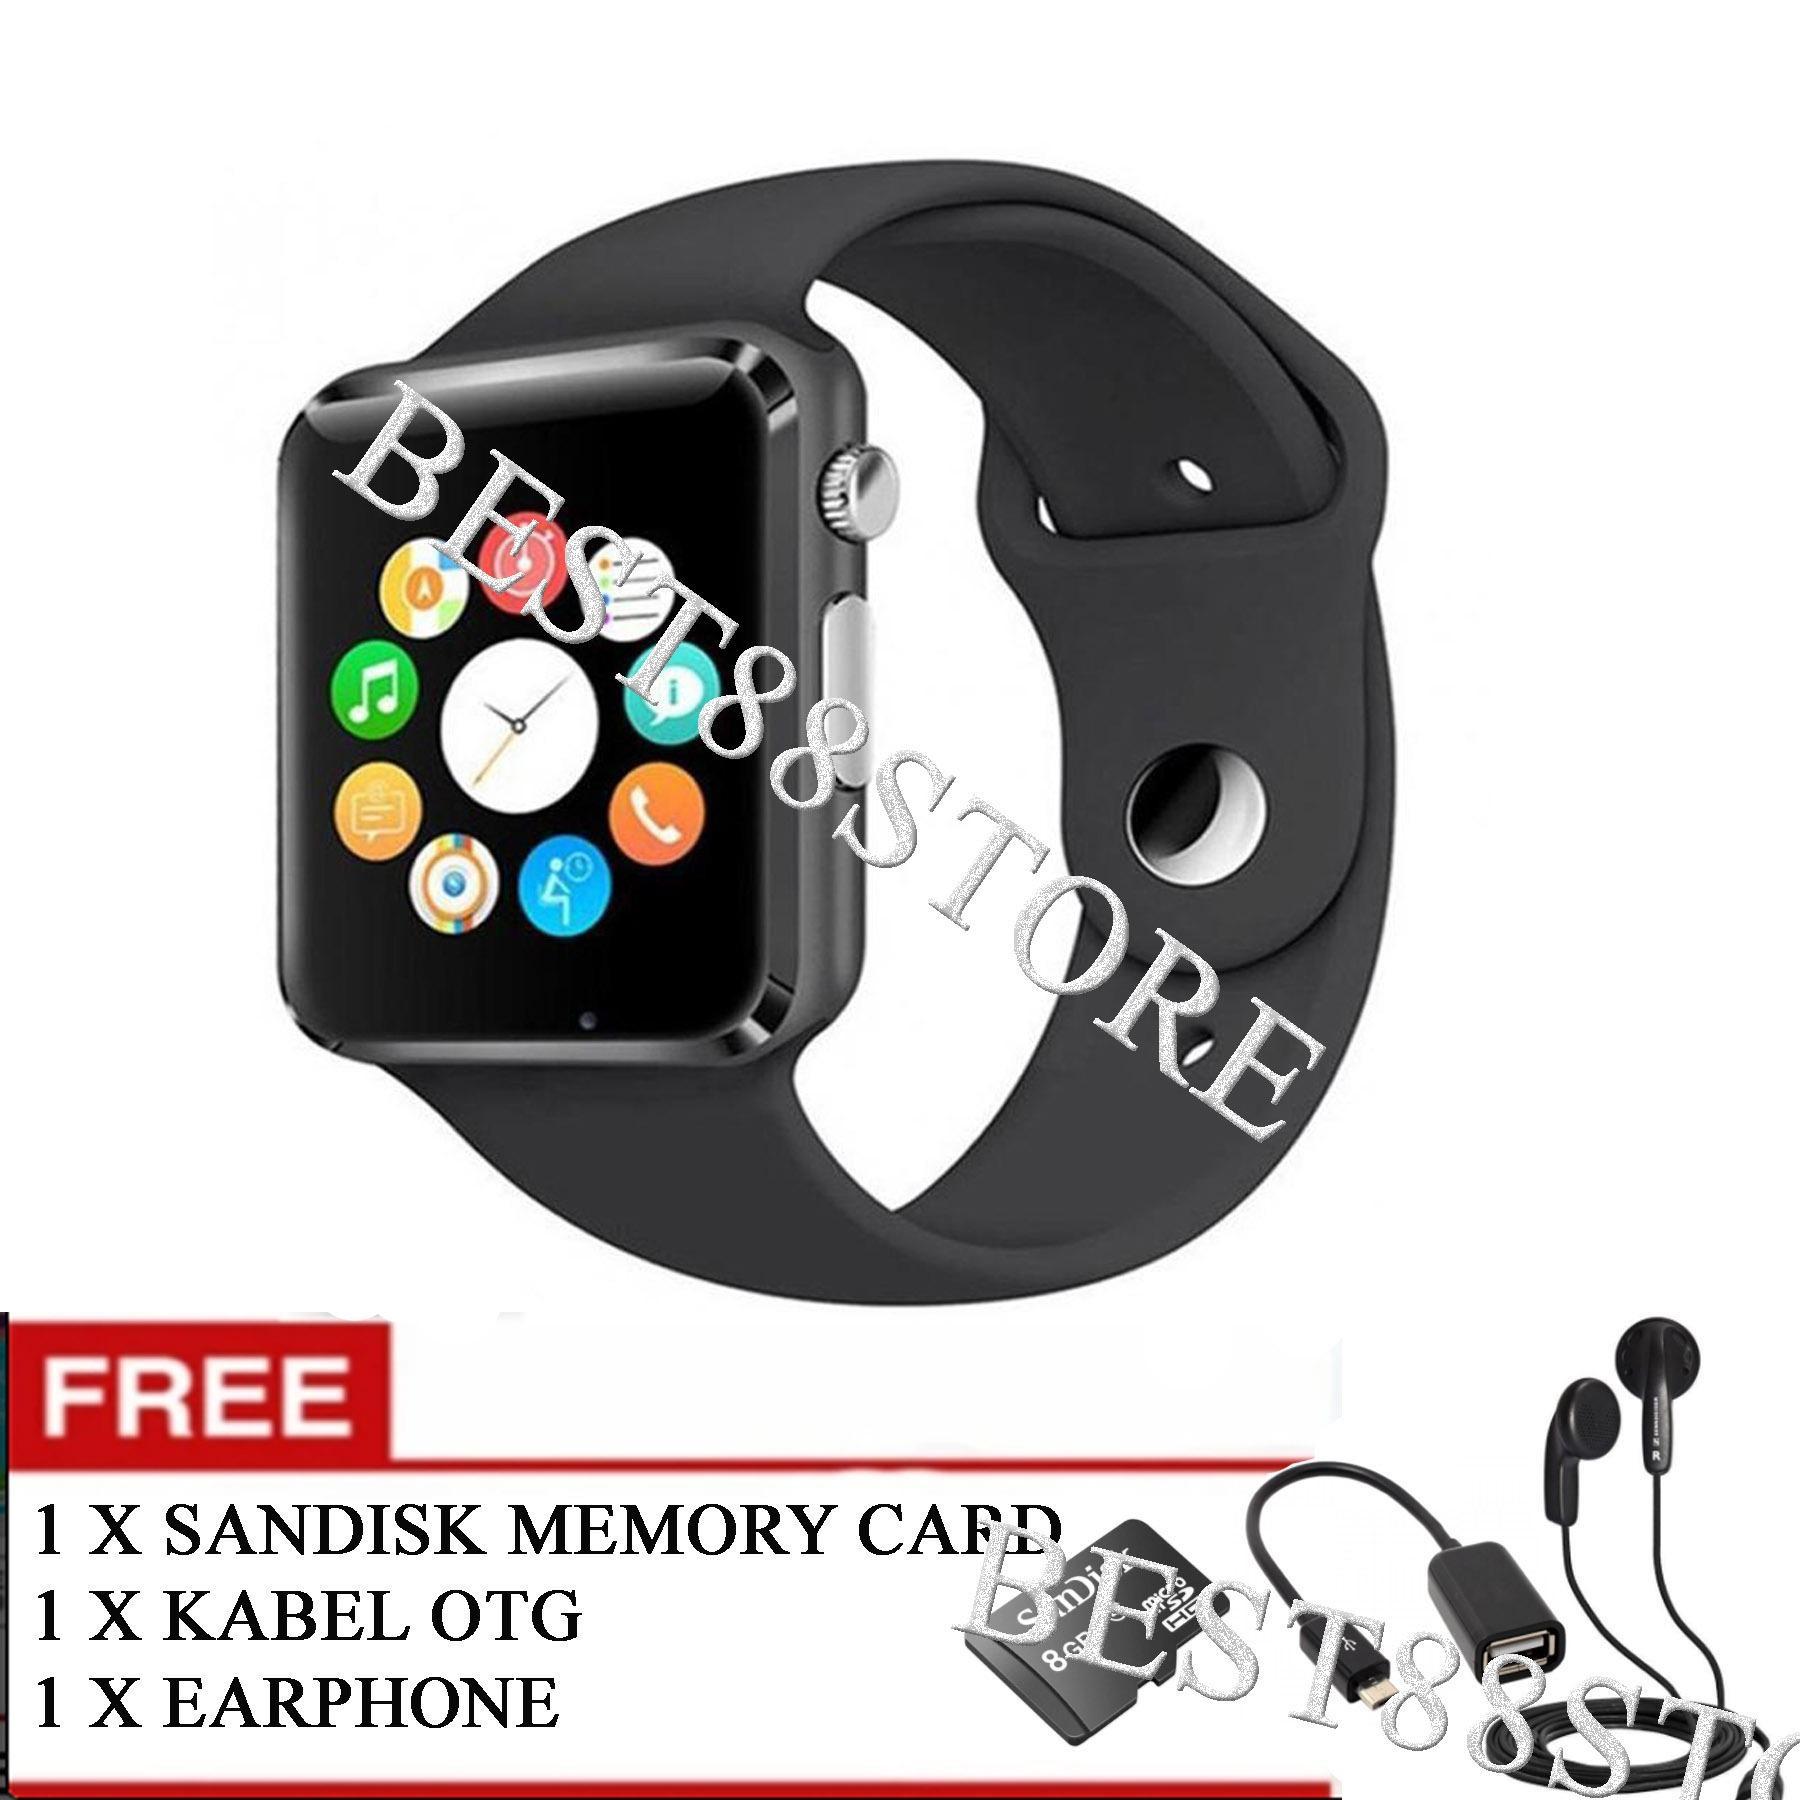 SKY Jam Tangan iwatch U10 / A1 Smart Watch Touch Screen + GSM Smartwatch Gear FREE Memory Card + Kabel OTG + Earphone